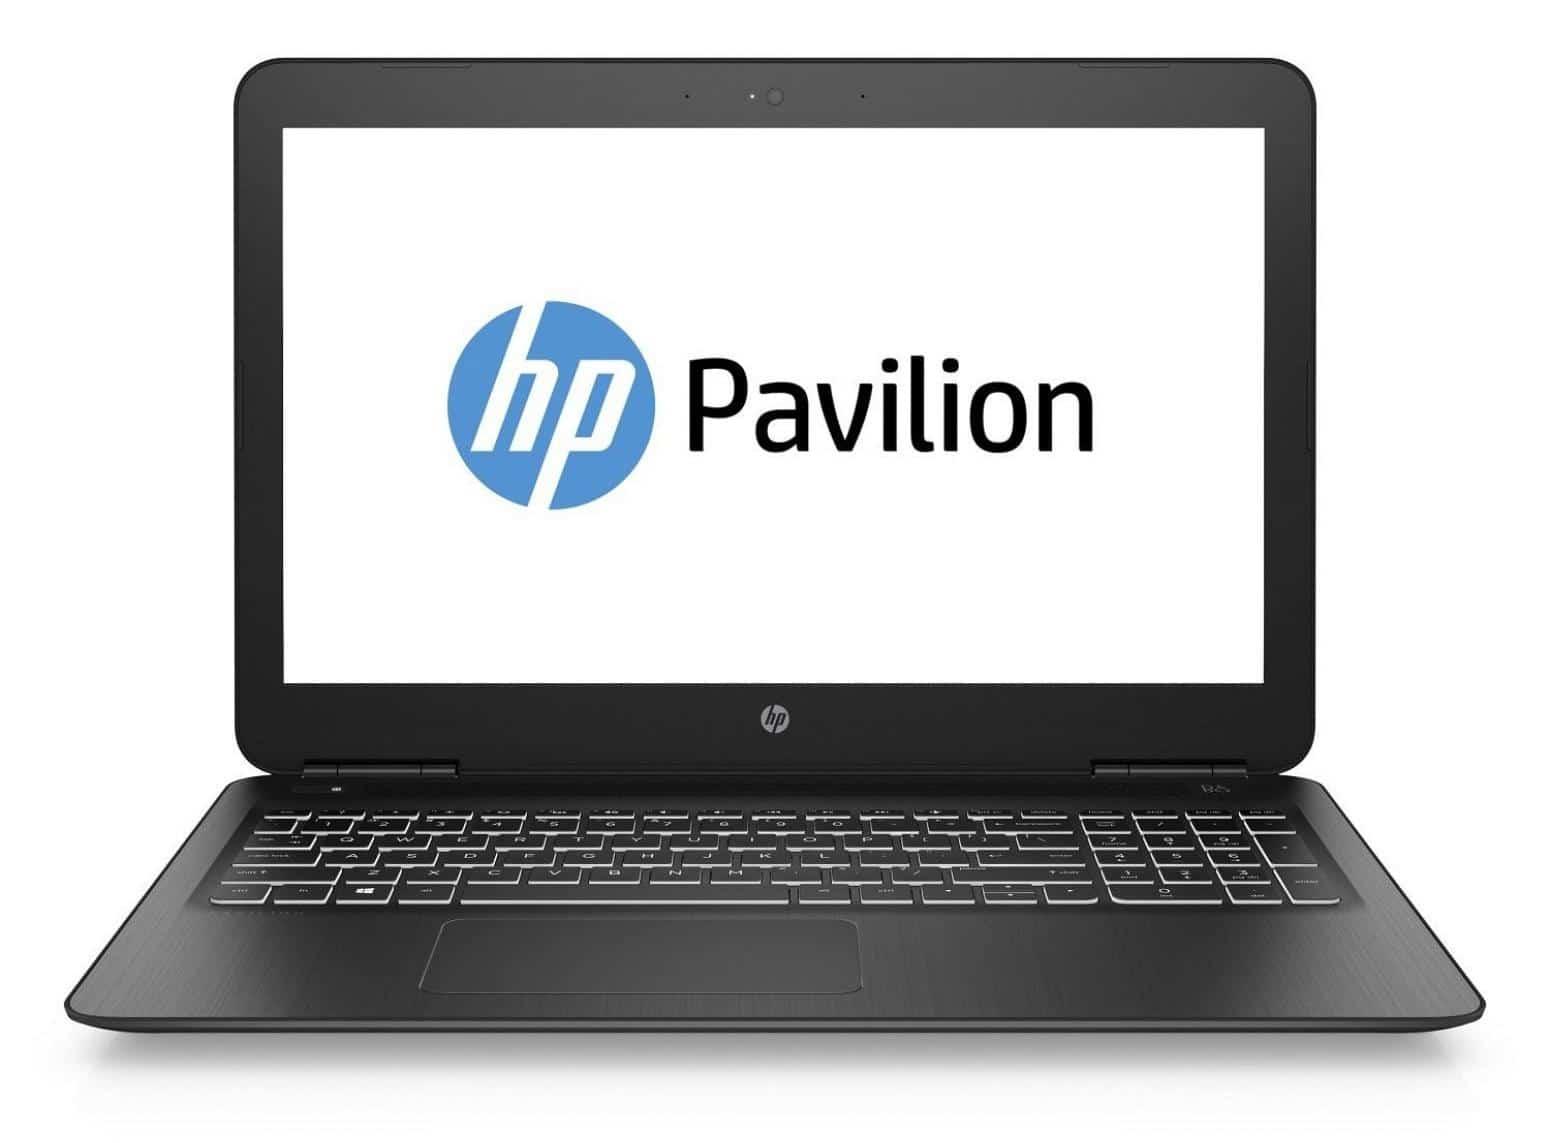 HP Pavilion 15-bc310nf, PC portable 15 pouces Full i5 GTX 950M (540€)